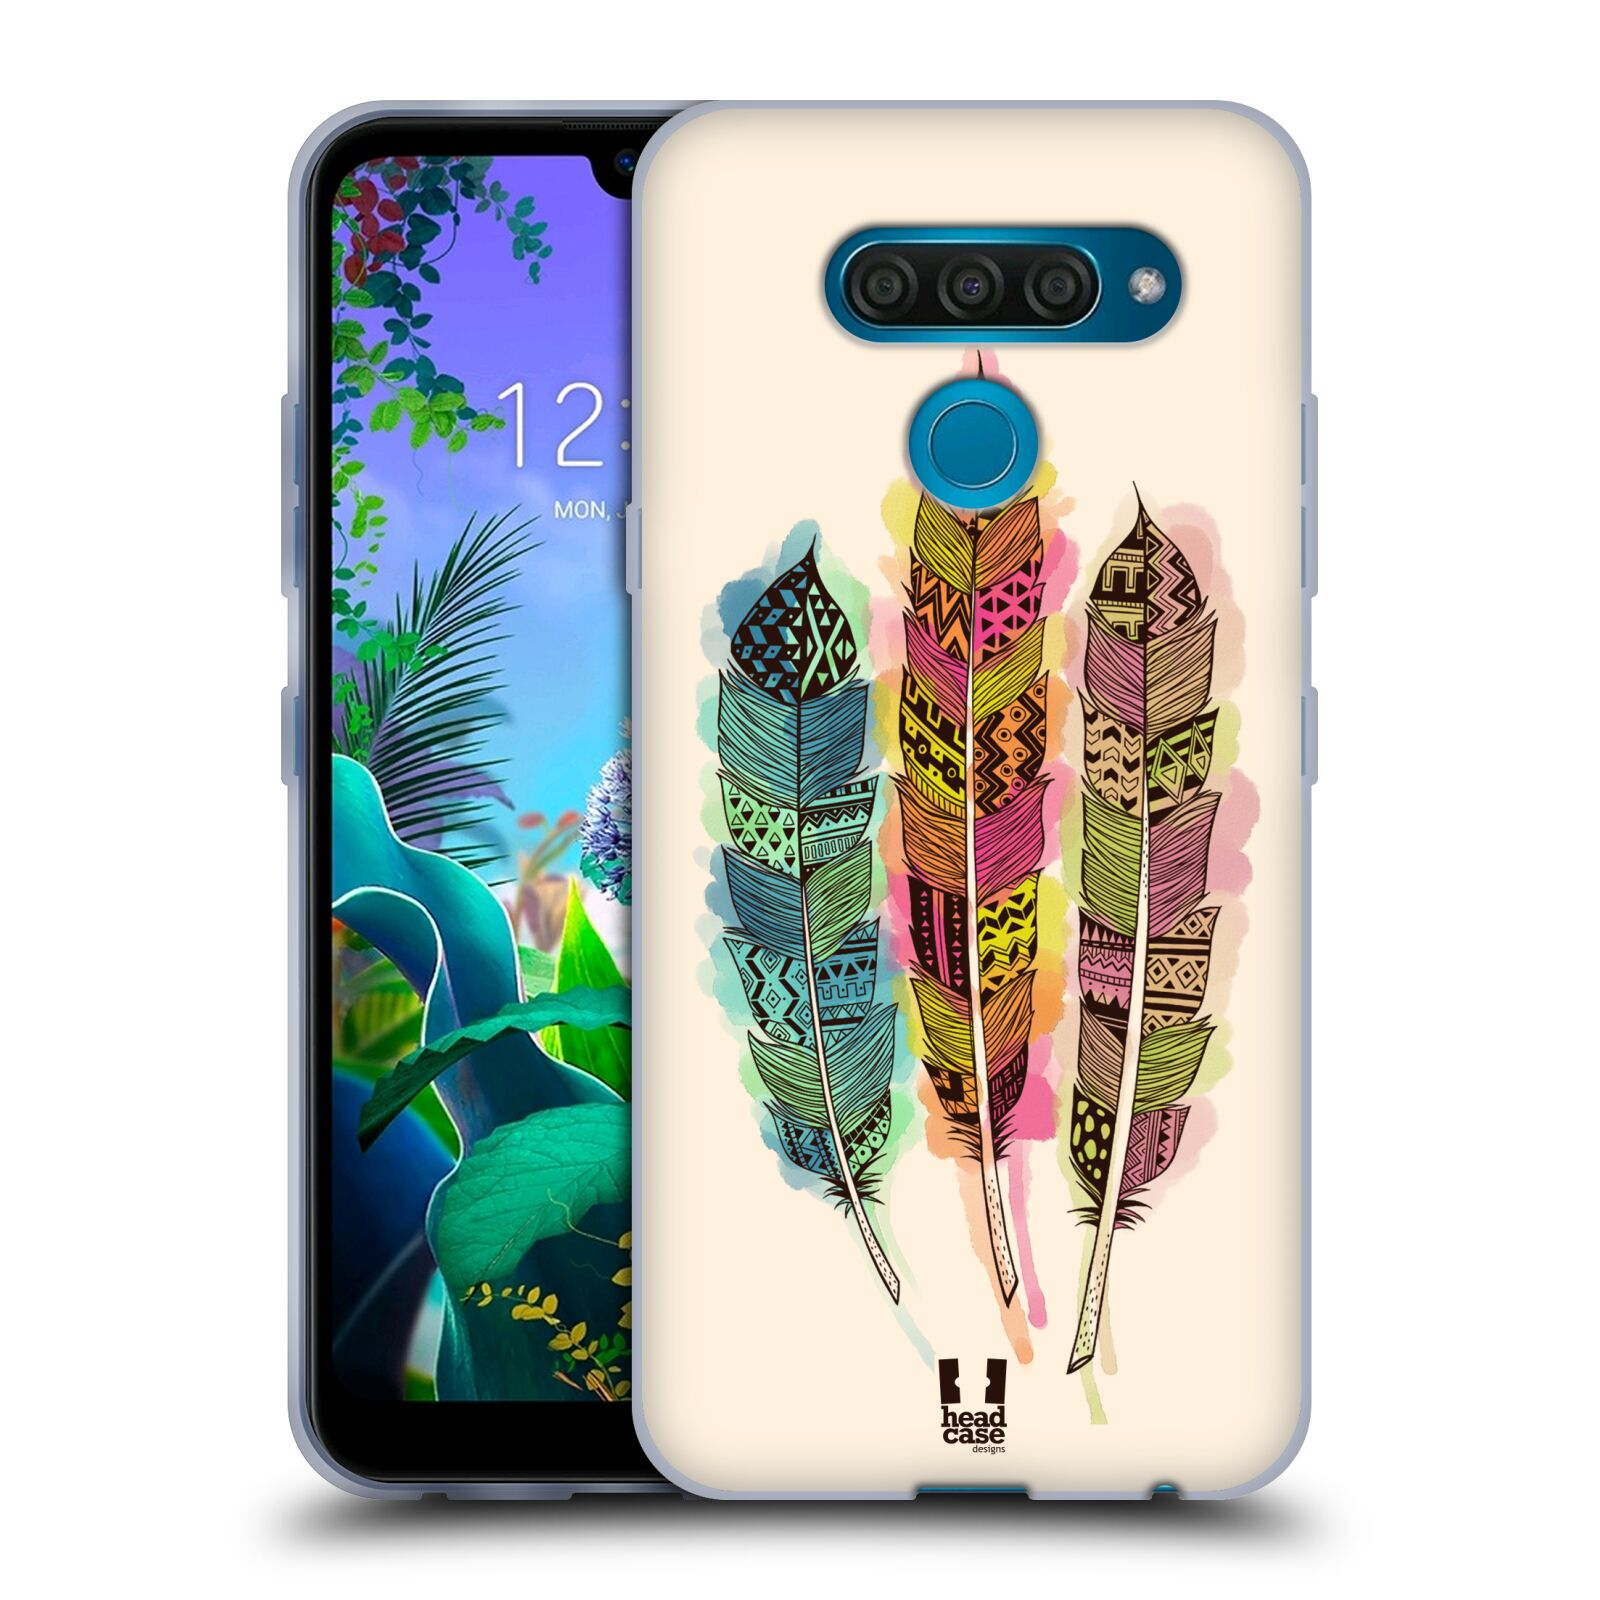 Silikonové pouzdro na mobil LG Q60 - Head Case - AZTEC PÍRKA SPLASH